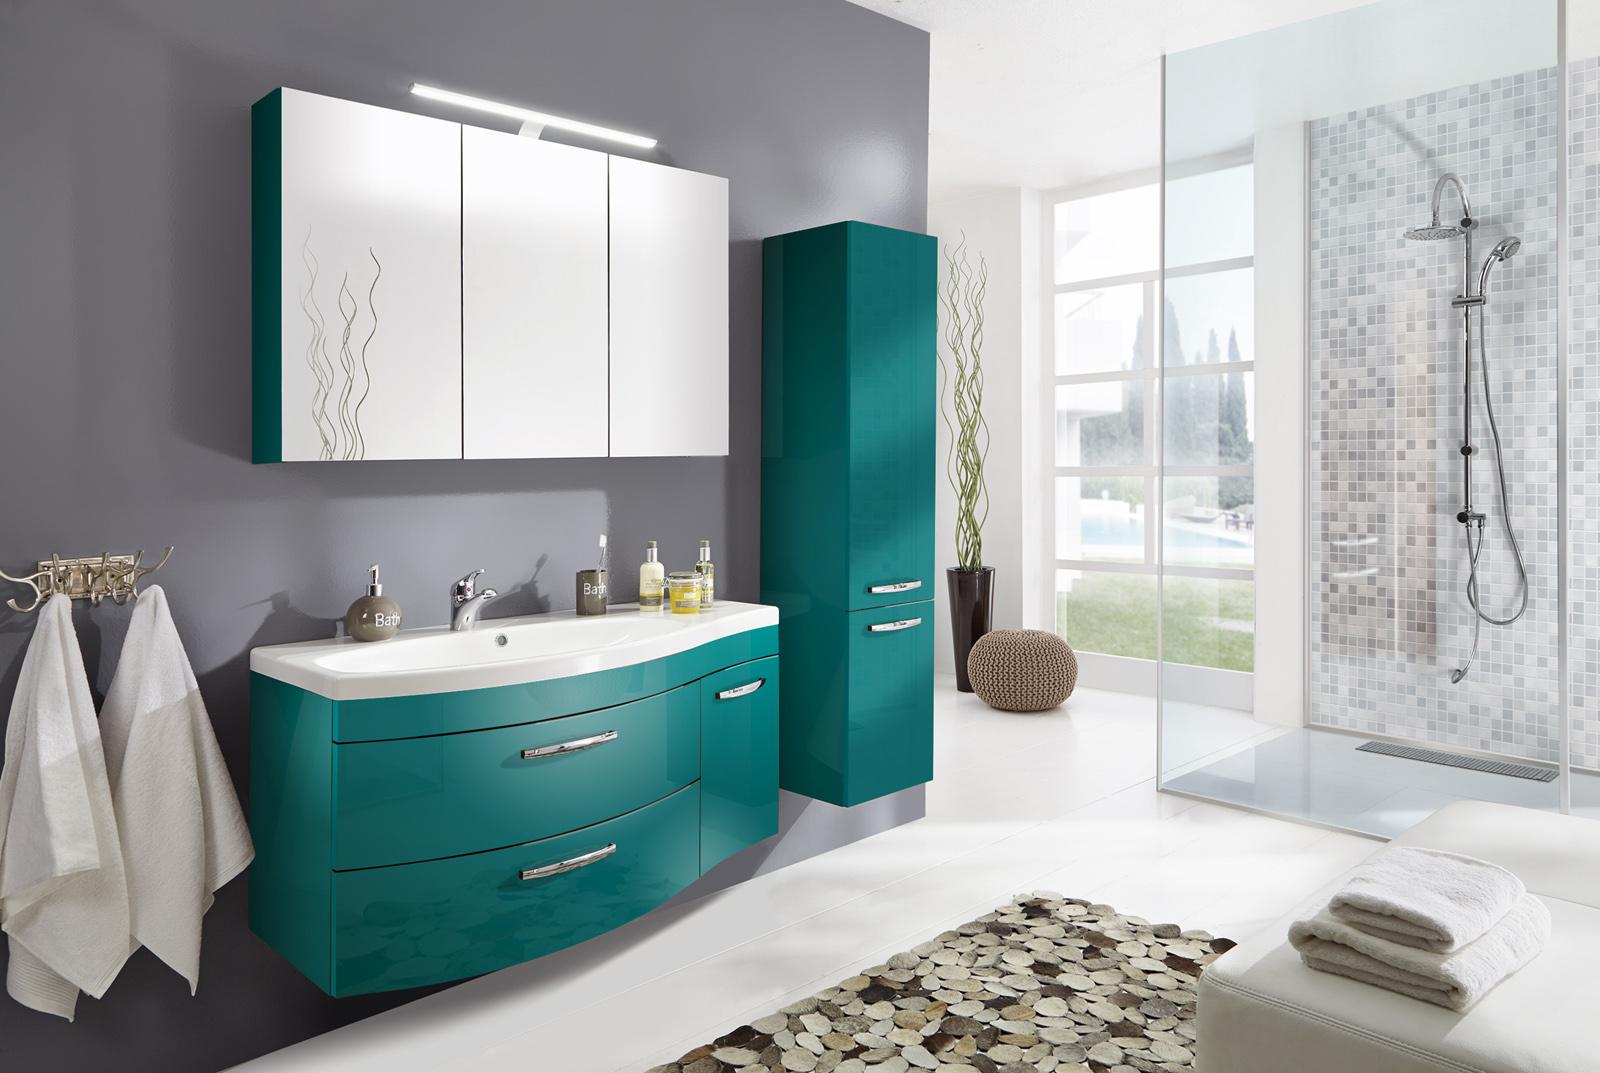 sam badm bel hochglanz t rkis 3tlg spiegelauswahl vena. Black Bedroom Furniture Sets. Home Design Ideas